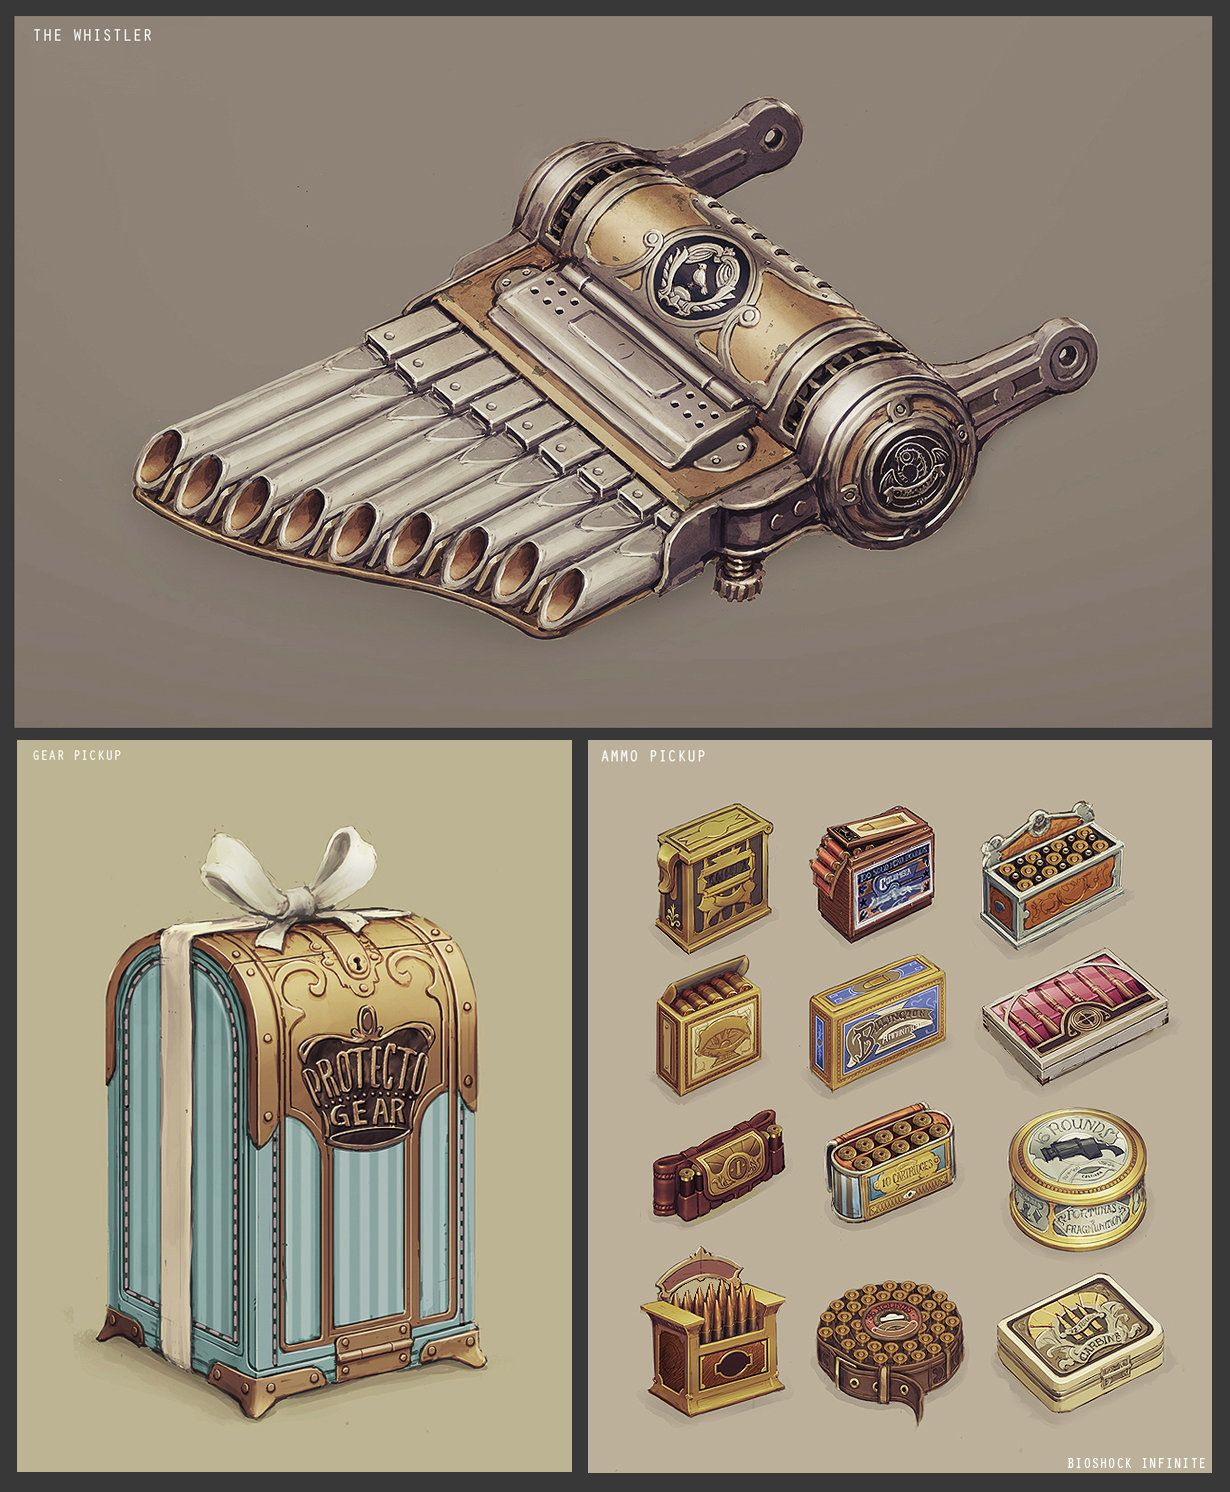 Various Bioshock Infinite, Chris Chaproniere on ArtStation at https://www.artstation.com/artwork/songbird-whistler-gear-and-ammo-pickups